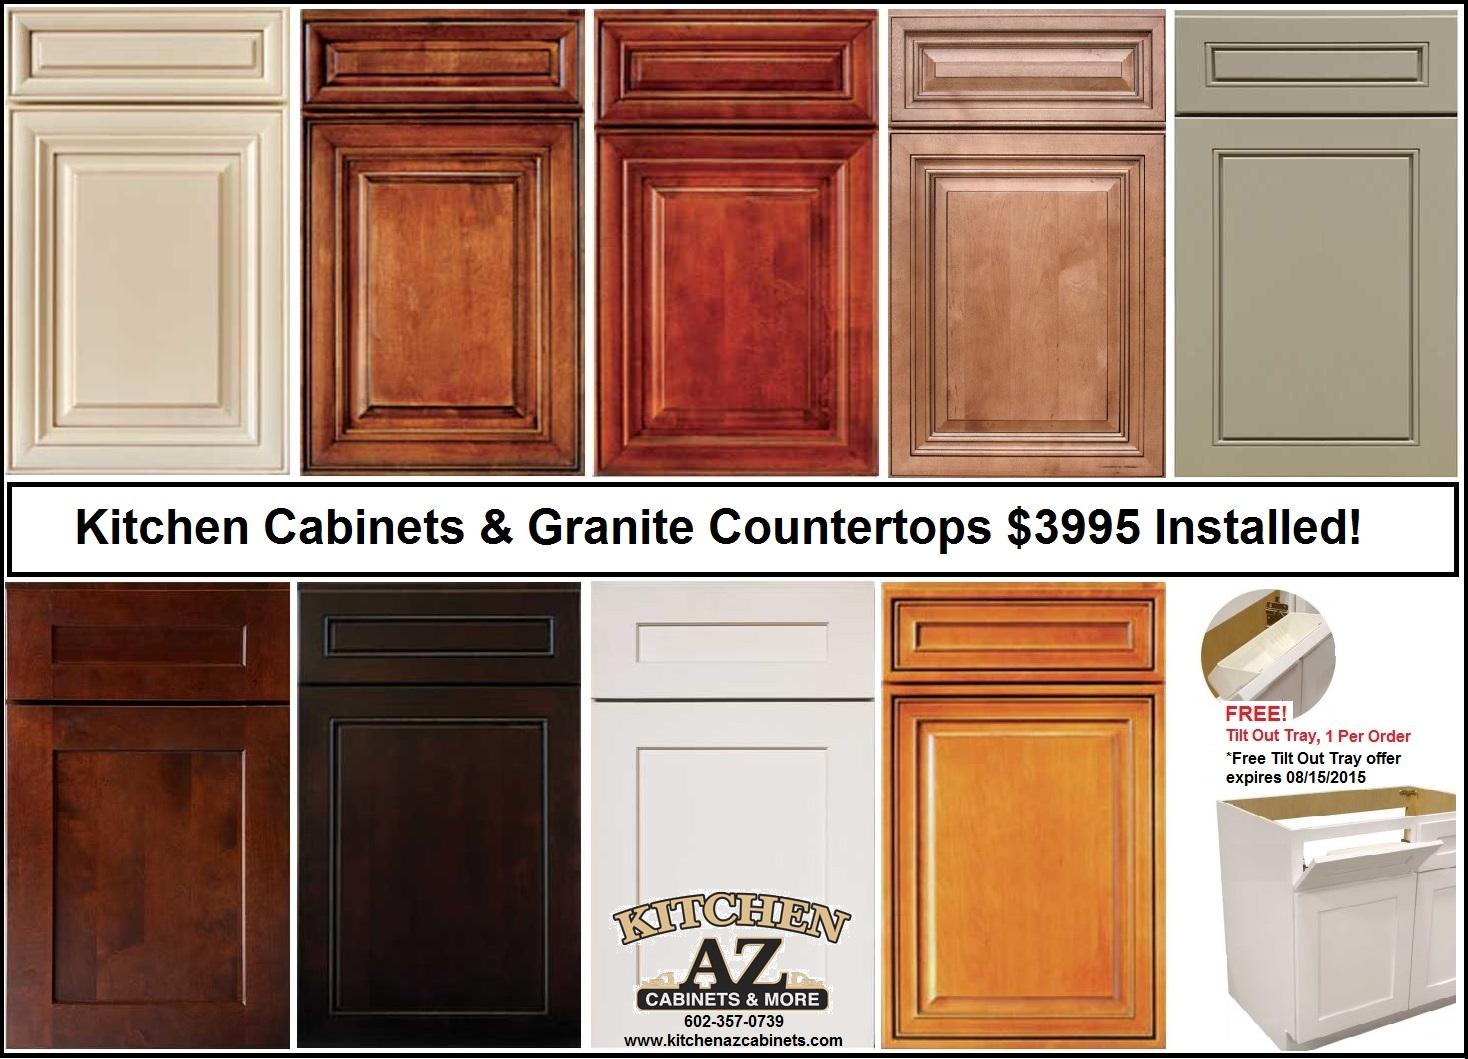 Glendale Az Kitchen Cabinets Granite Countertops Sale